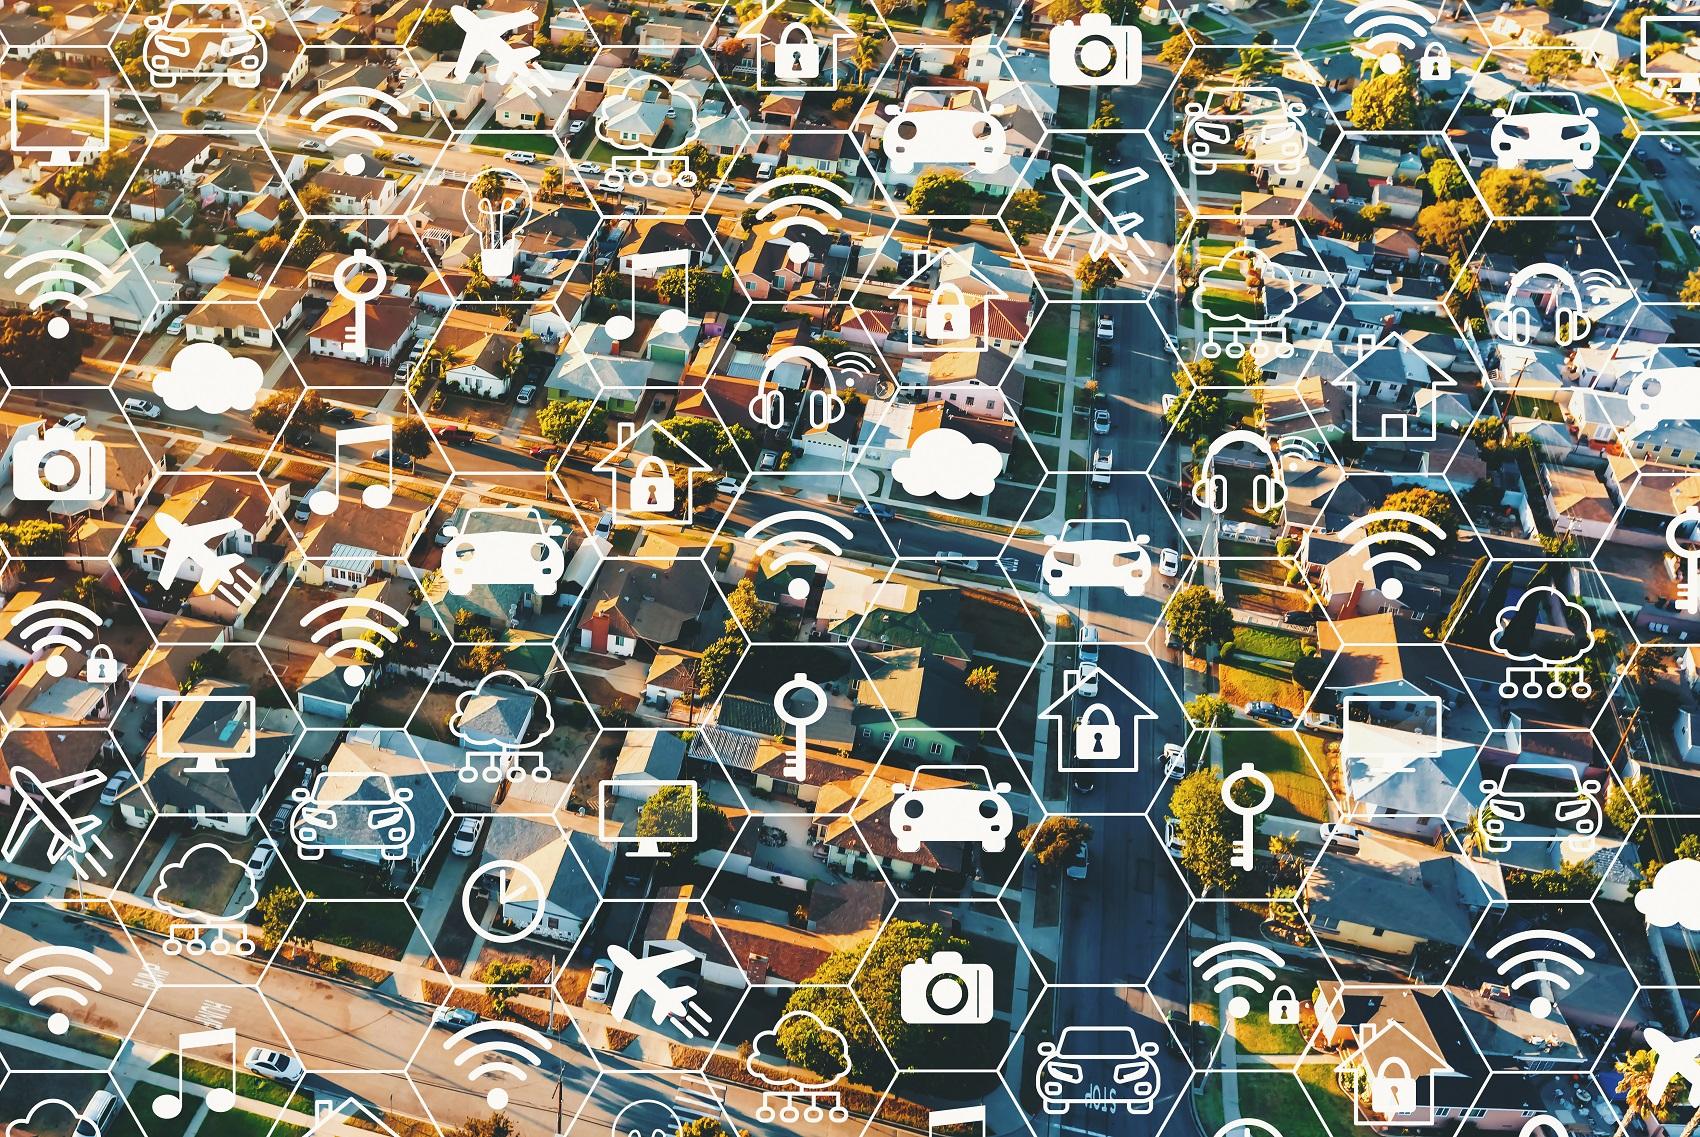 Seizing the IoT Ecosystem Opportunity TechNative